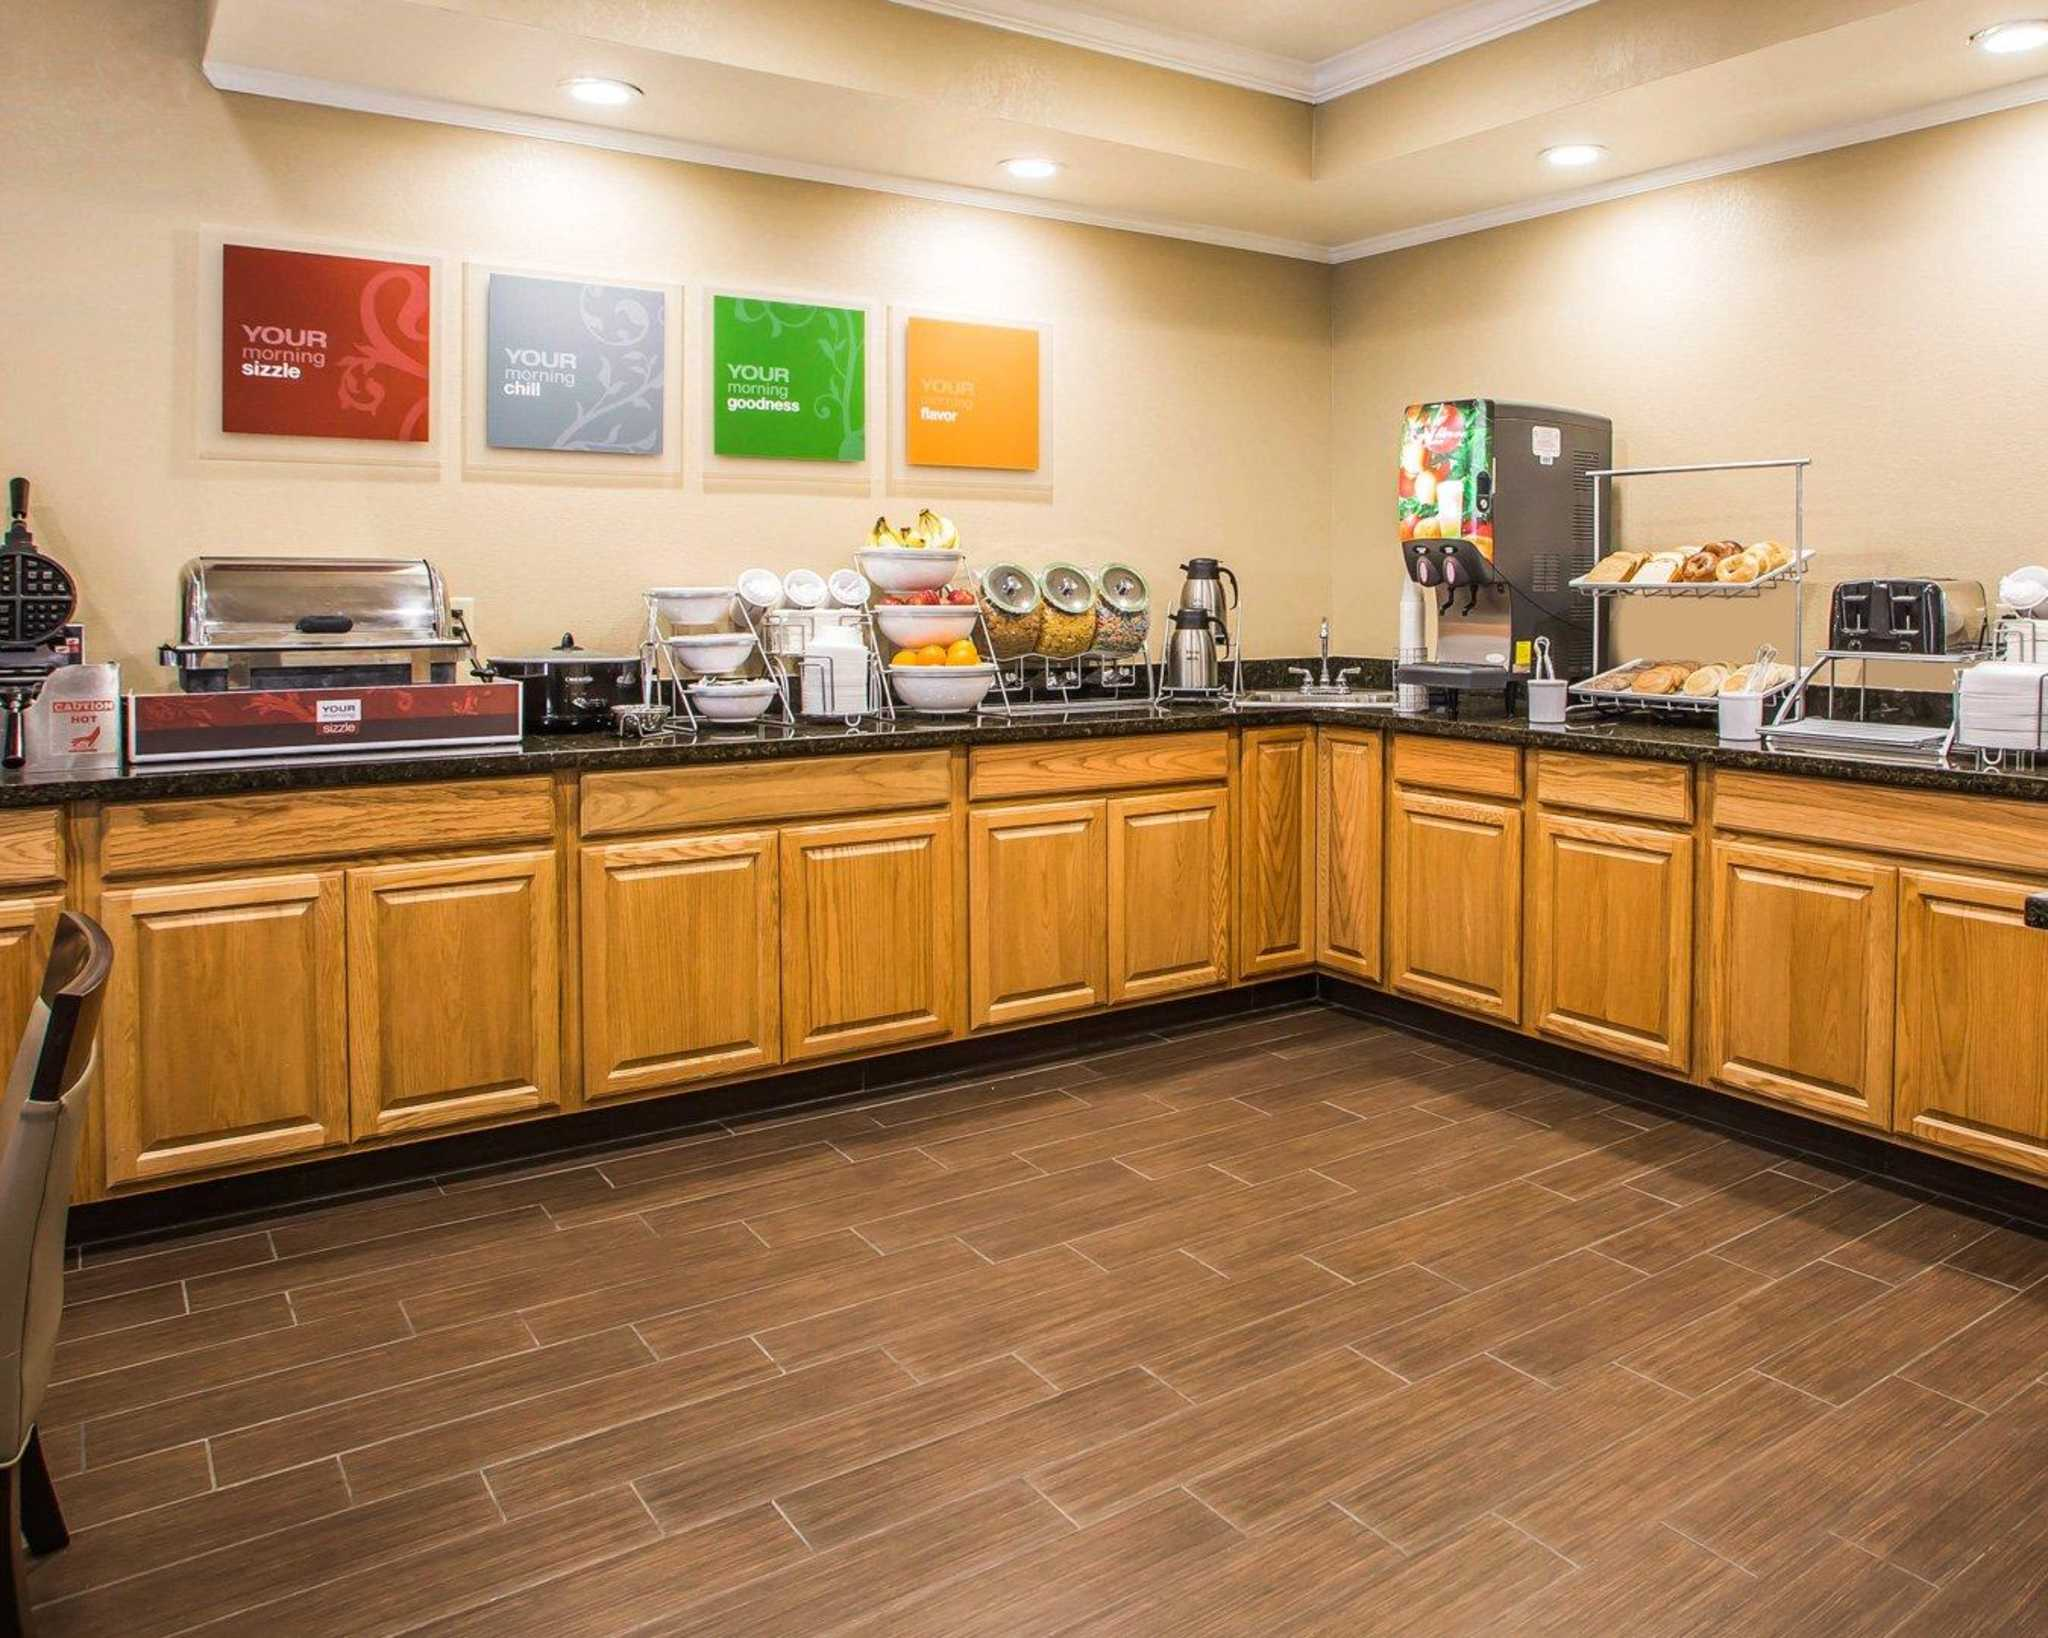 Comfort Inn & Suites Waterloo – Cedar Falls image 21